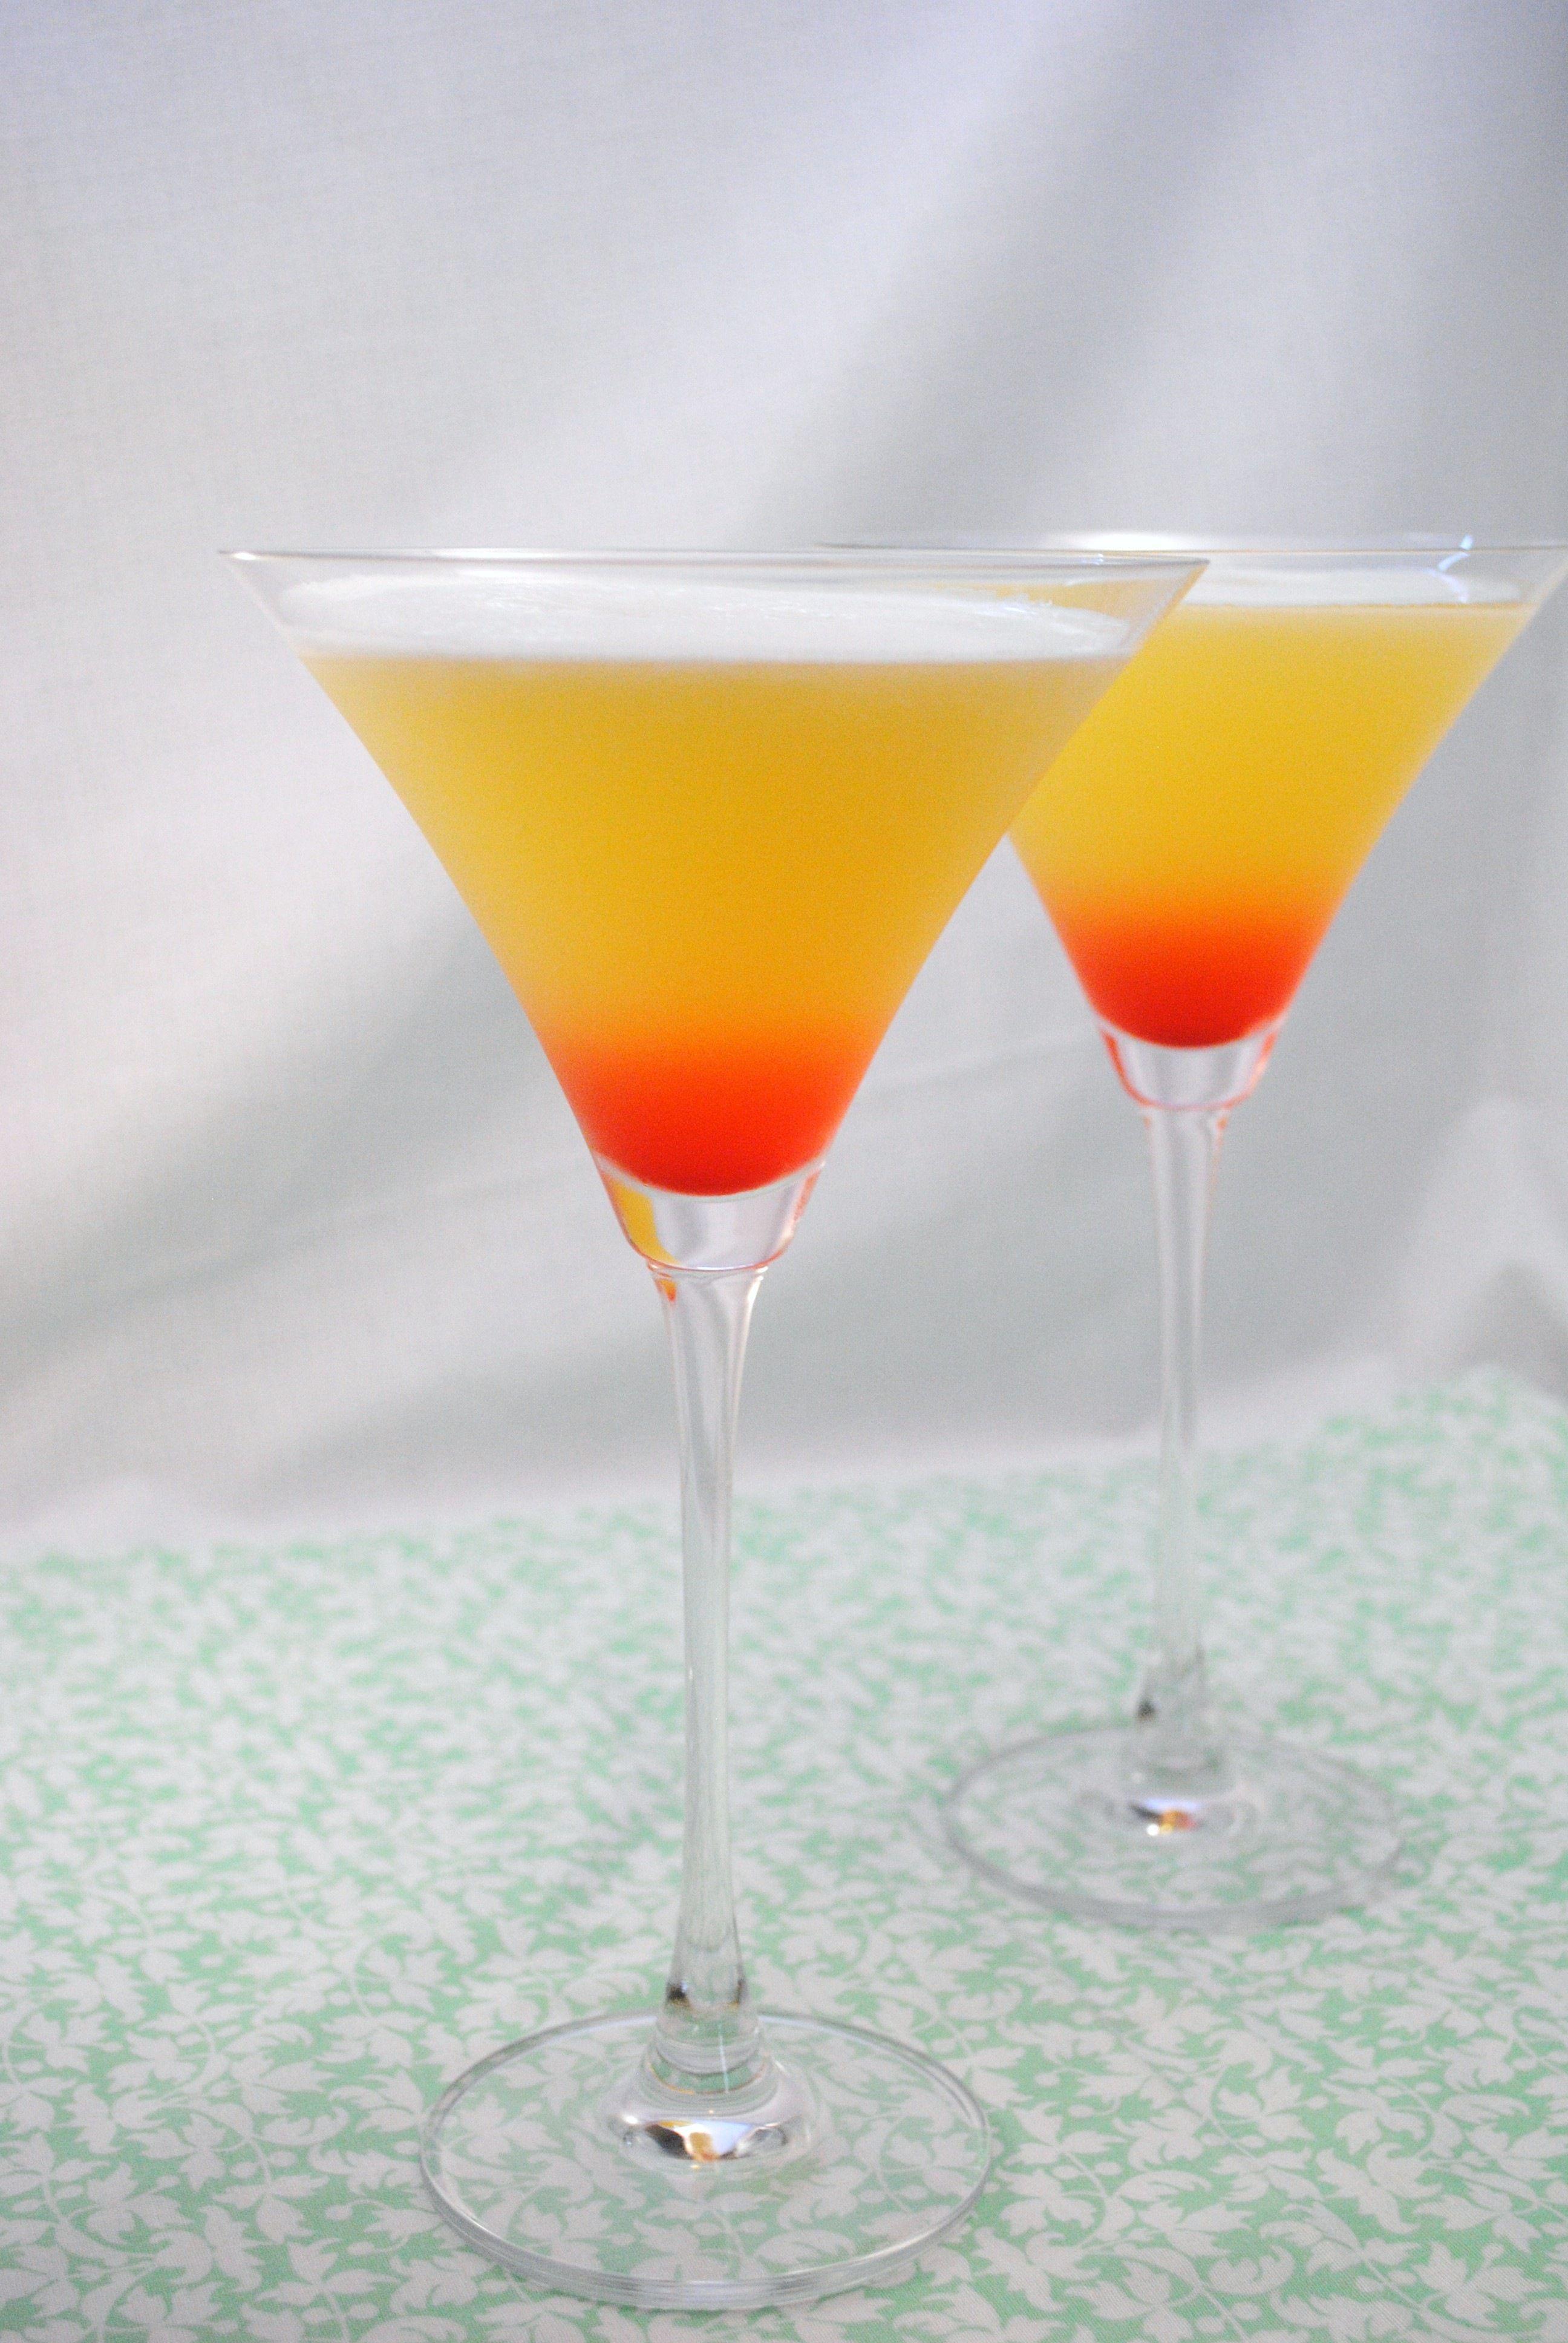 Bikini Martini - coconut rum, vodka, pineapple juice & grenadine